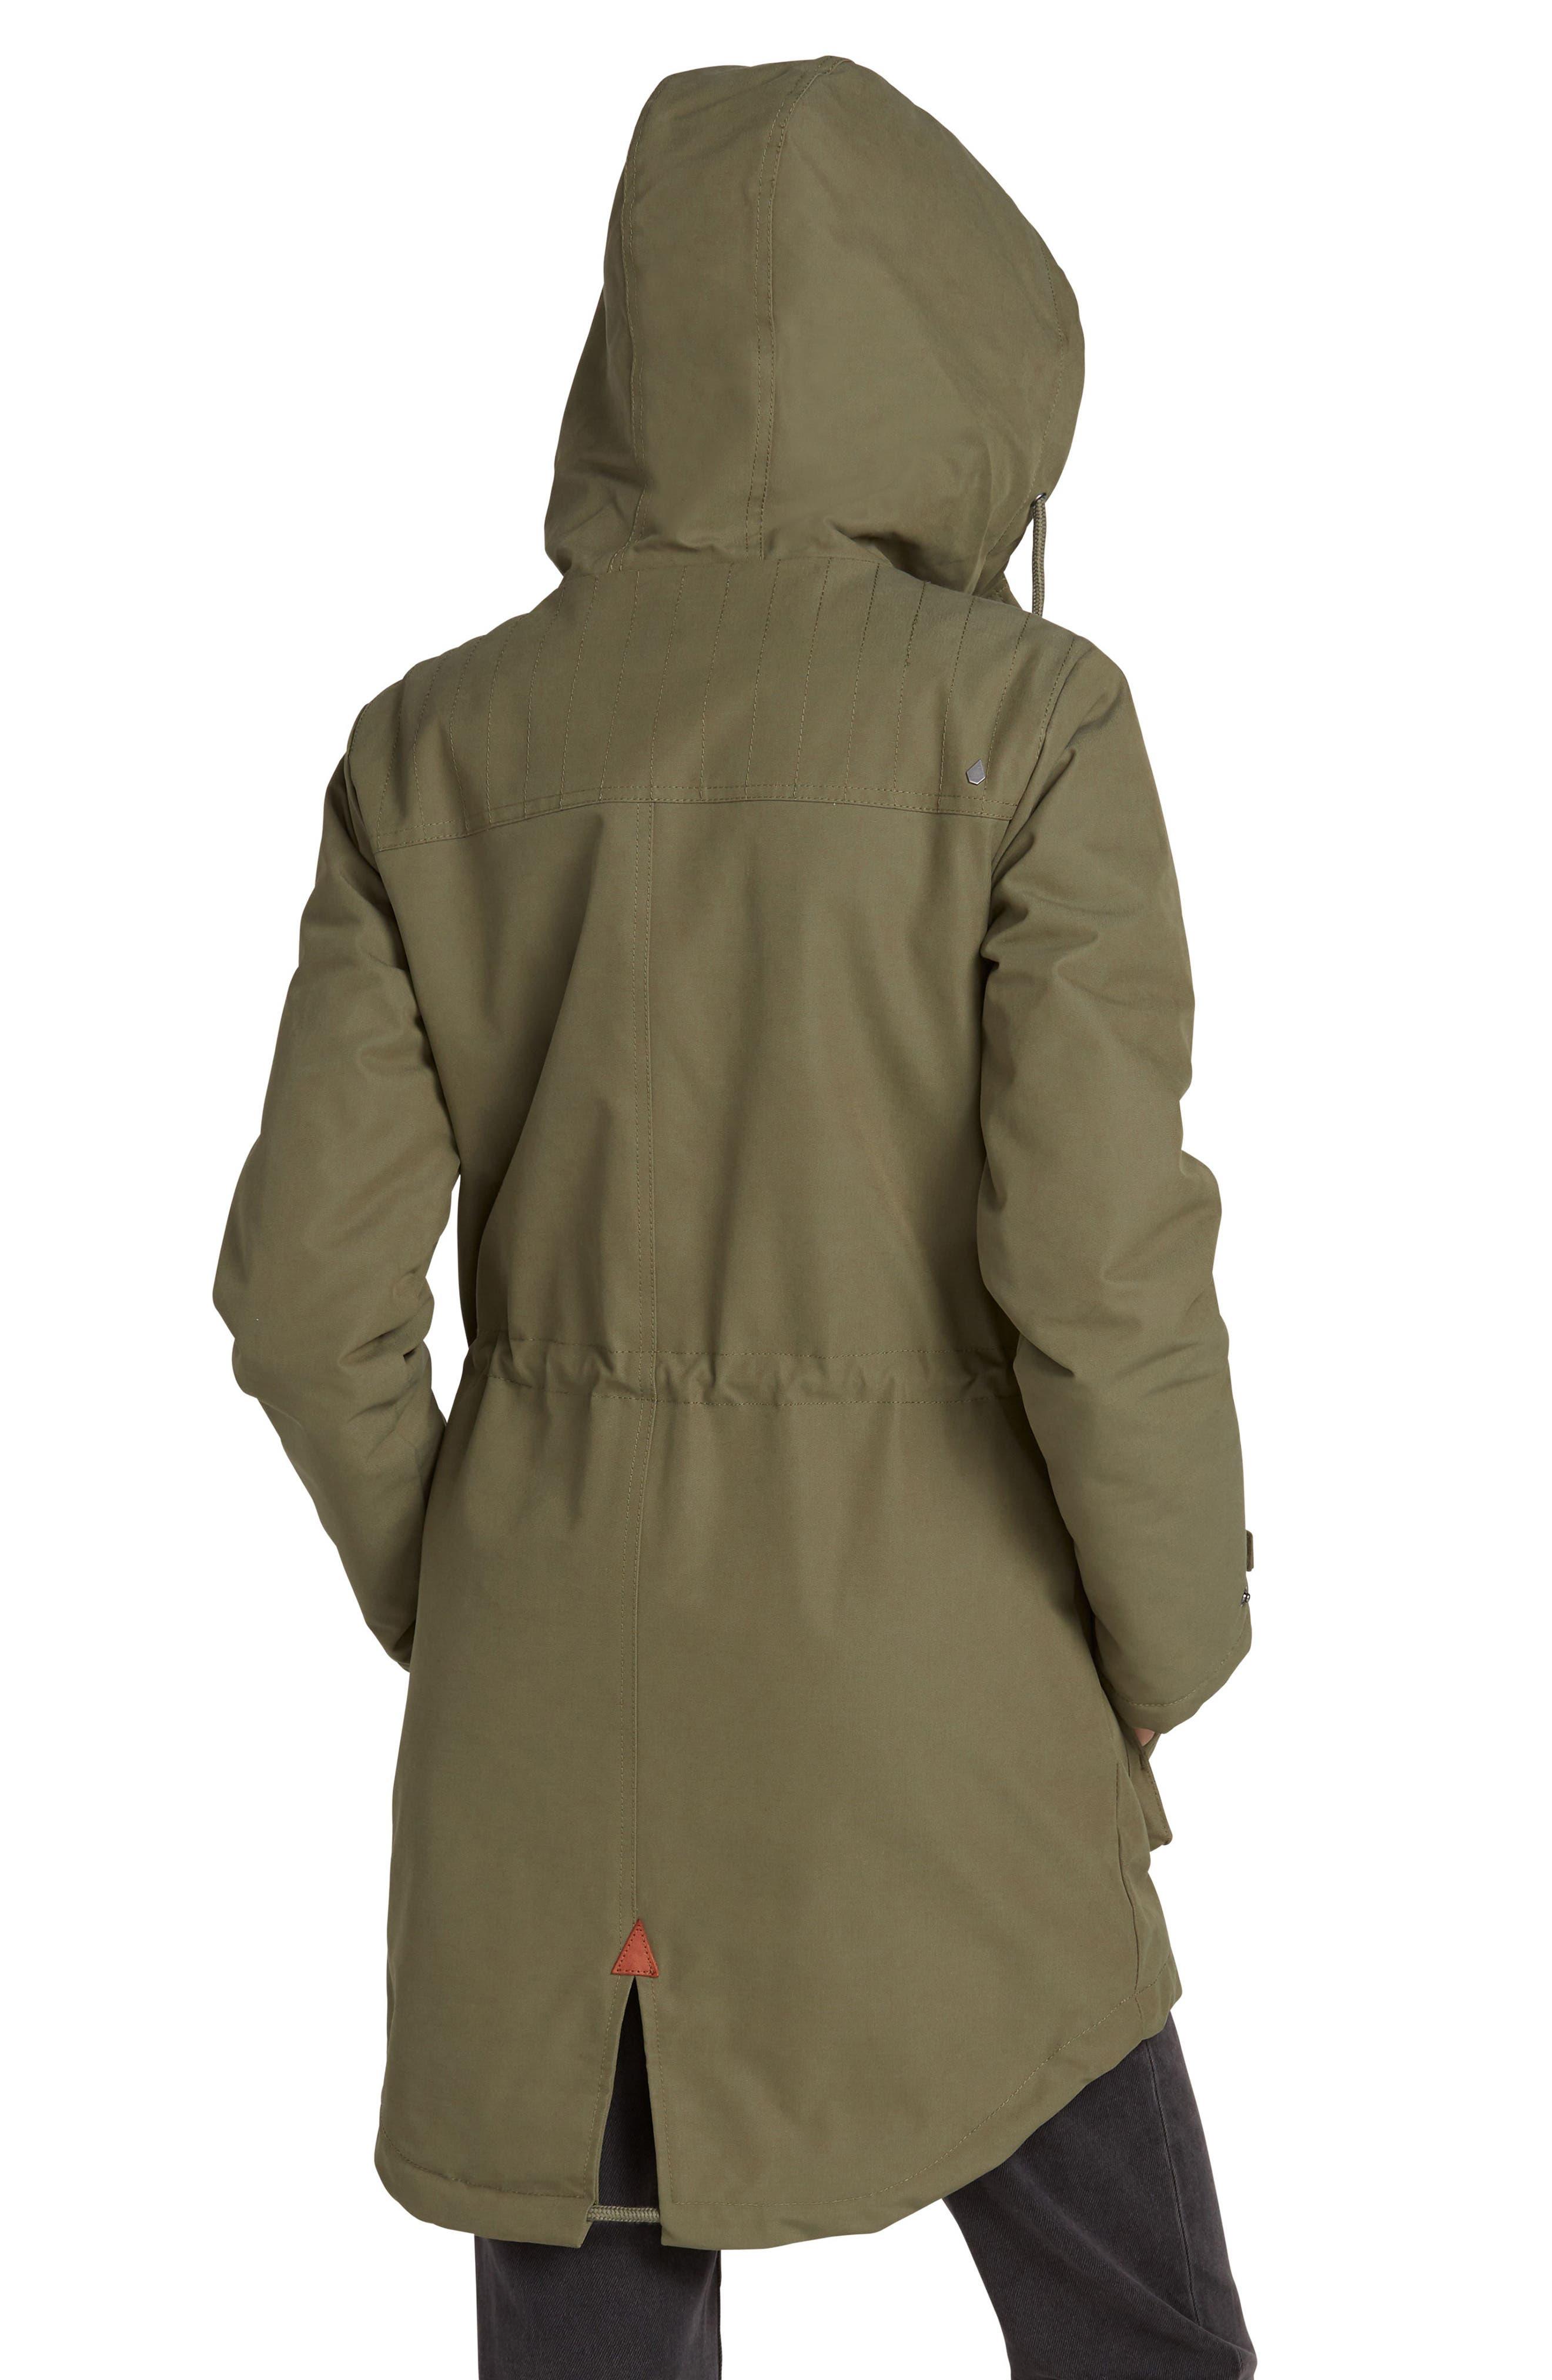 8a9b1ee60b1d1 Women's Coats & Jackets New Arrivals: Clothing, Shoes & Beauty | Nordstrom